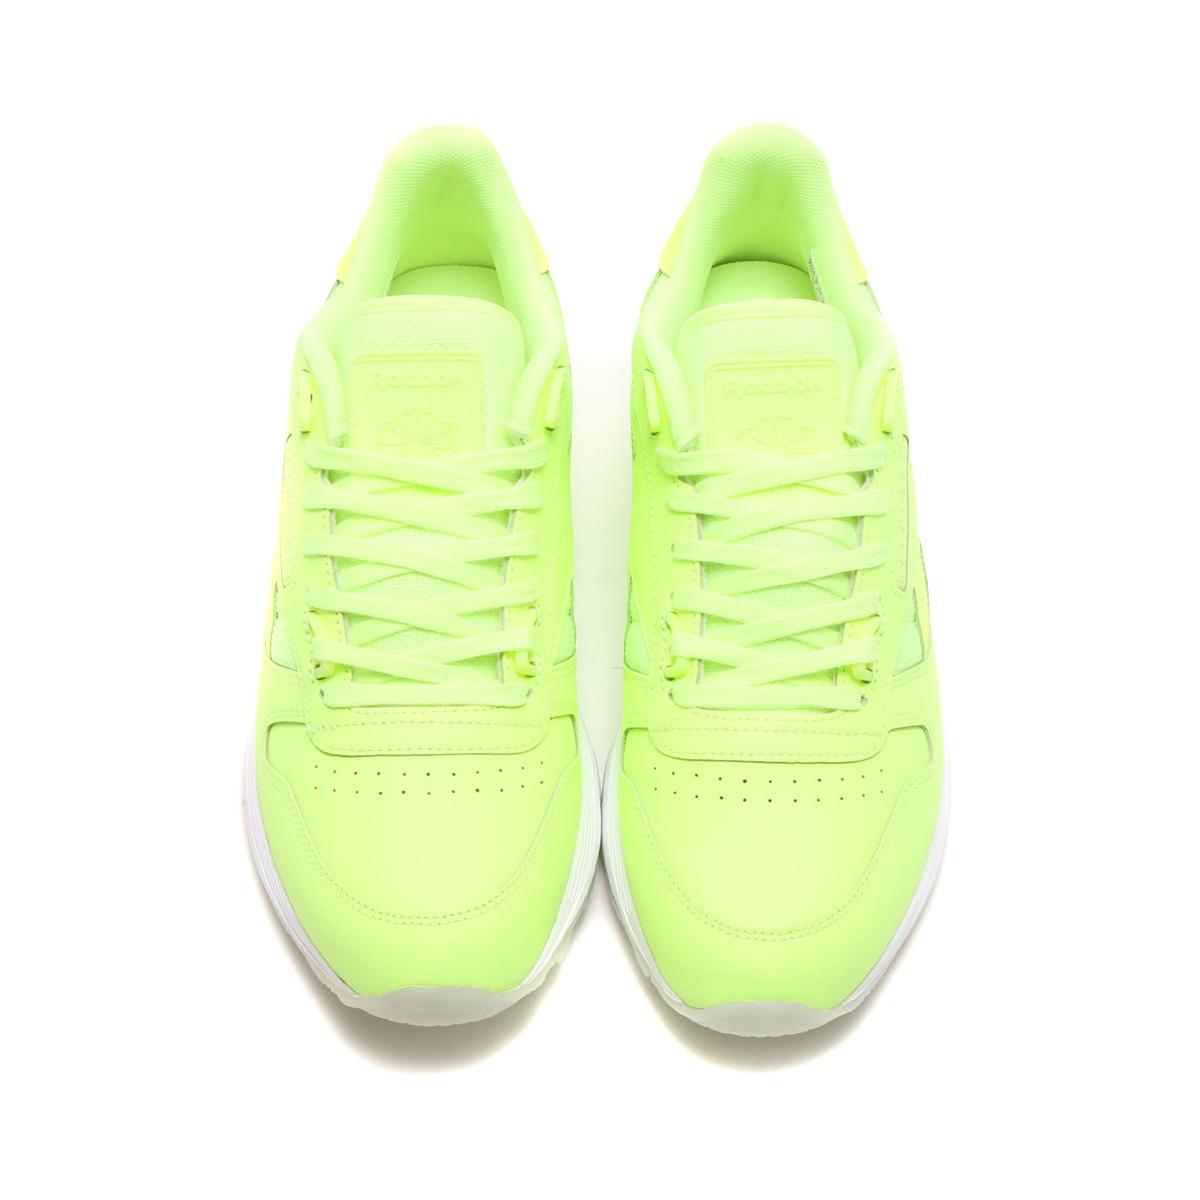 Reebok CL LEATHER 2.0 GID (Reebok CL leather 2.0 GID) ELECTRICL WHITE 18SS-S df4713420f